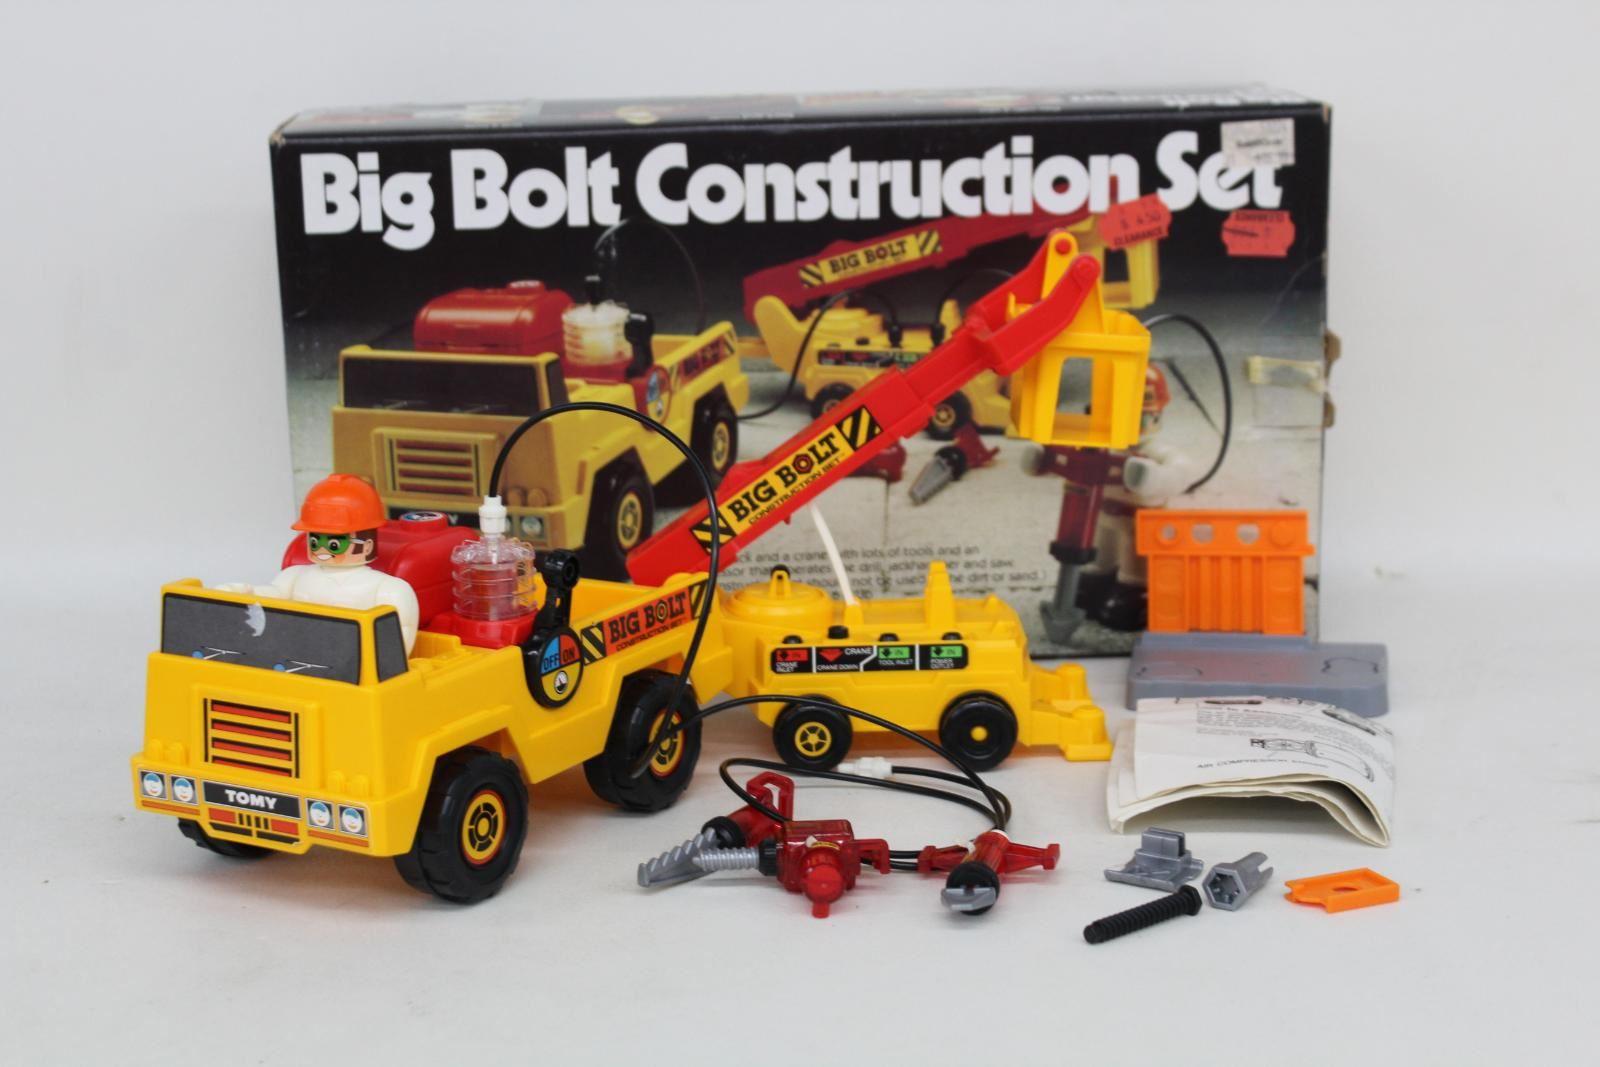 TOMY-Big-Bolt-Vintage-Air-Powered-Truck-Crane-Toy-Construction-Set-5005